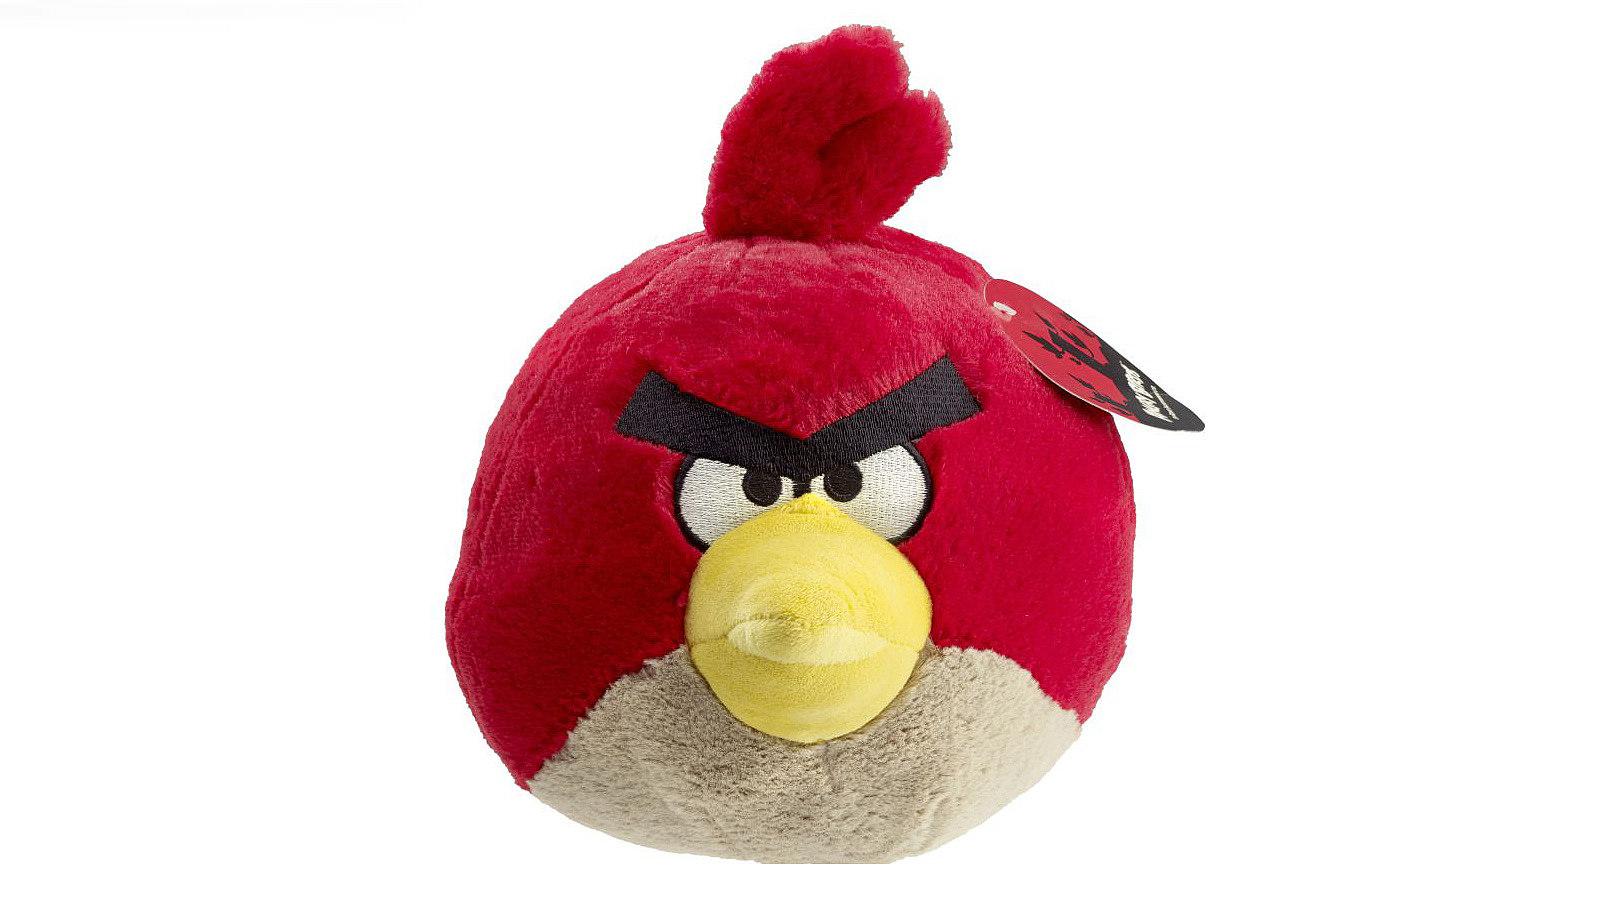 Plüschfigur Angry Bird, 2014